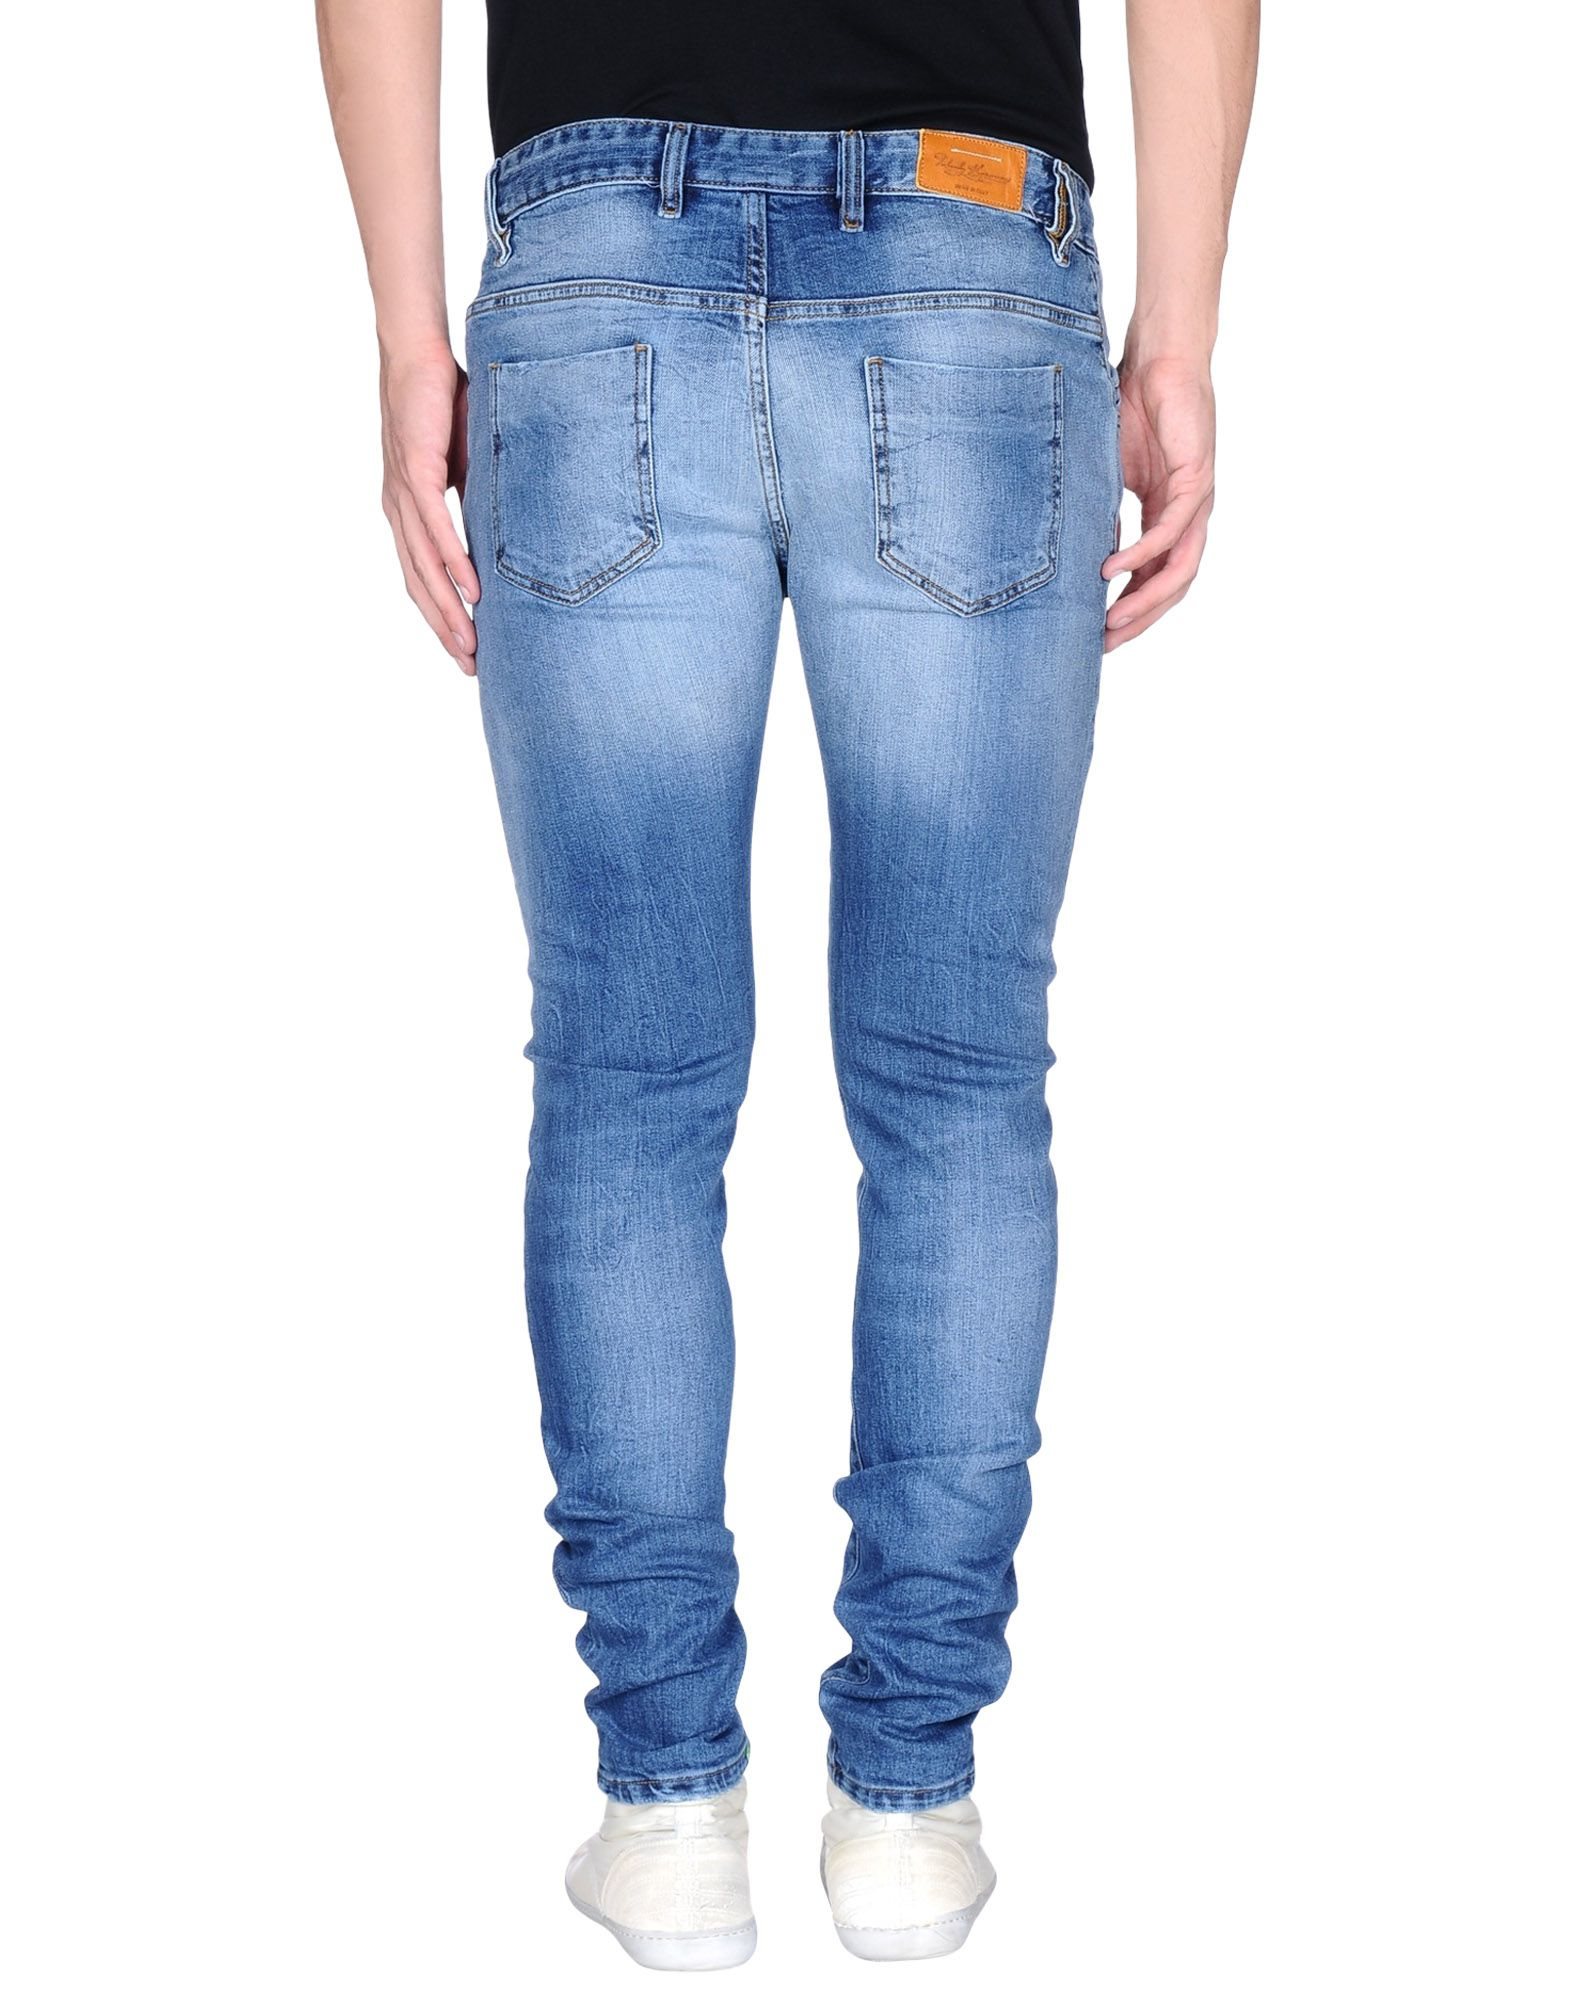 Lyst - Takeshy Kurosawa Denim Trousers in Blue for Men